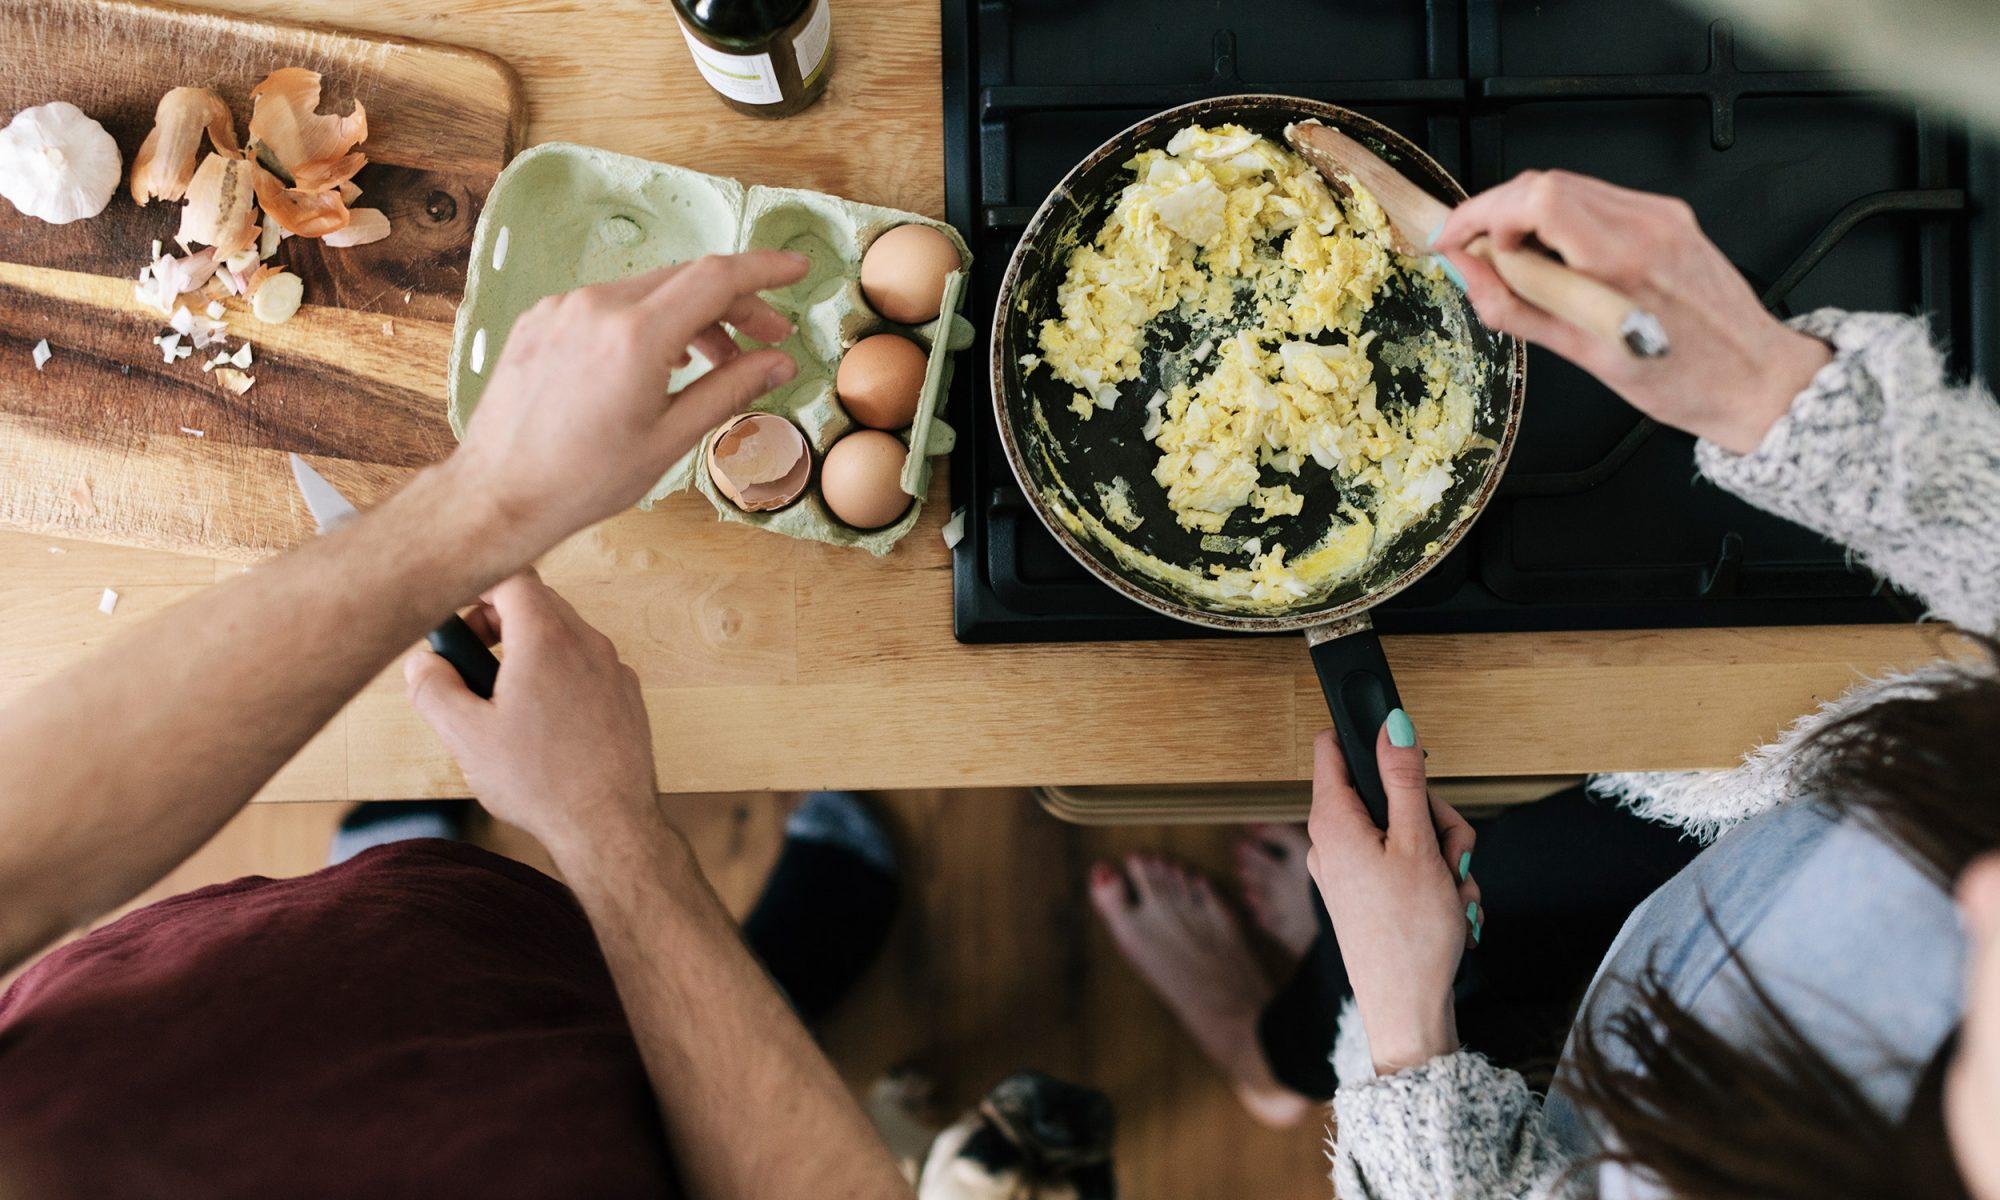 EC: 9 Easy Breakfast Ingredient Swaps for When You're Broke